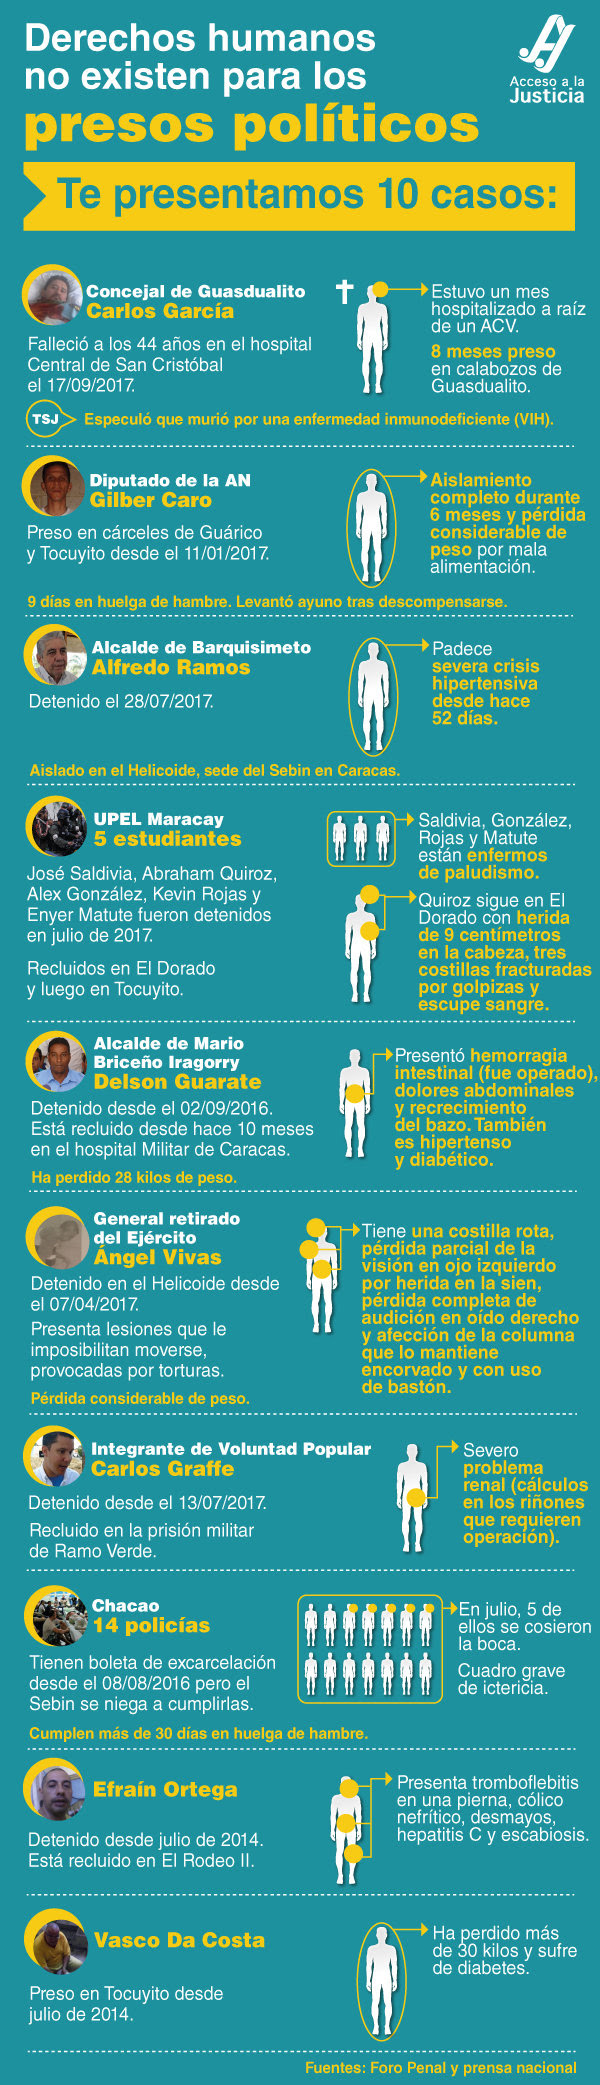 infografiapresos